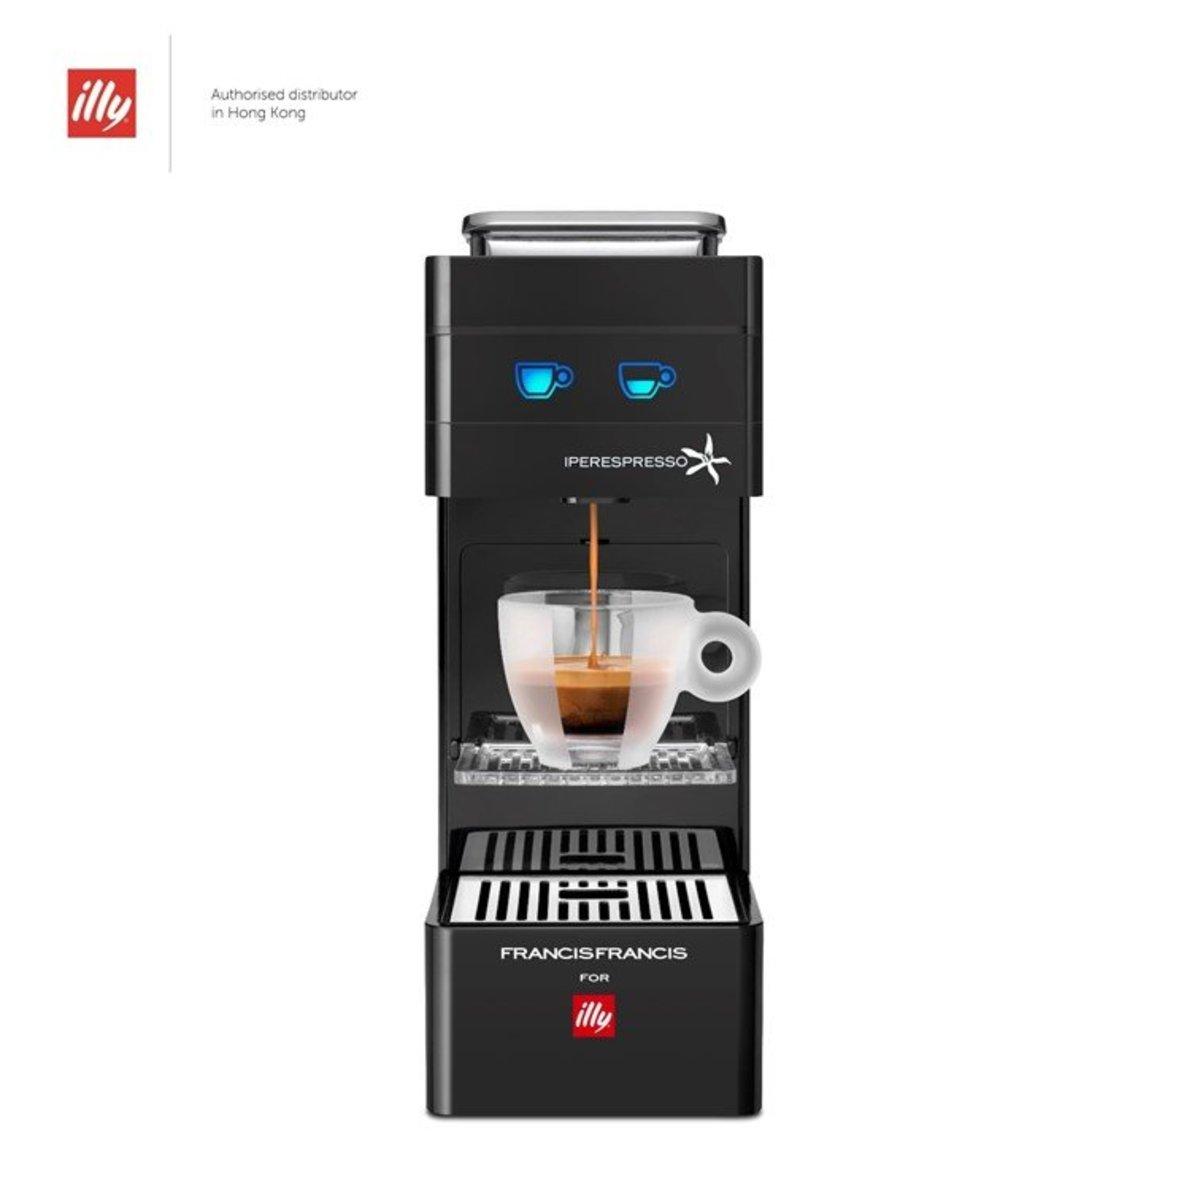 Y3A Iperespresso 家用特濃膠囊咖啡機 - 黑色